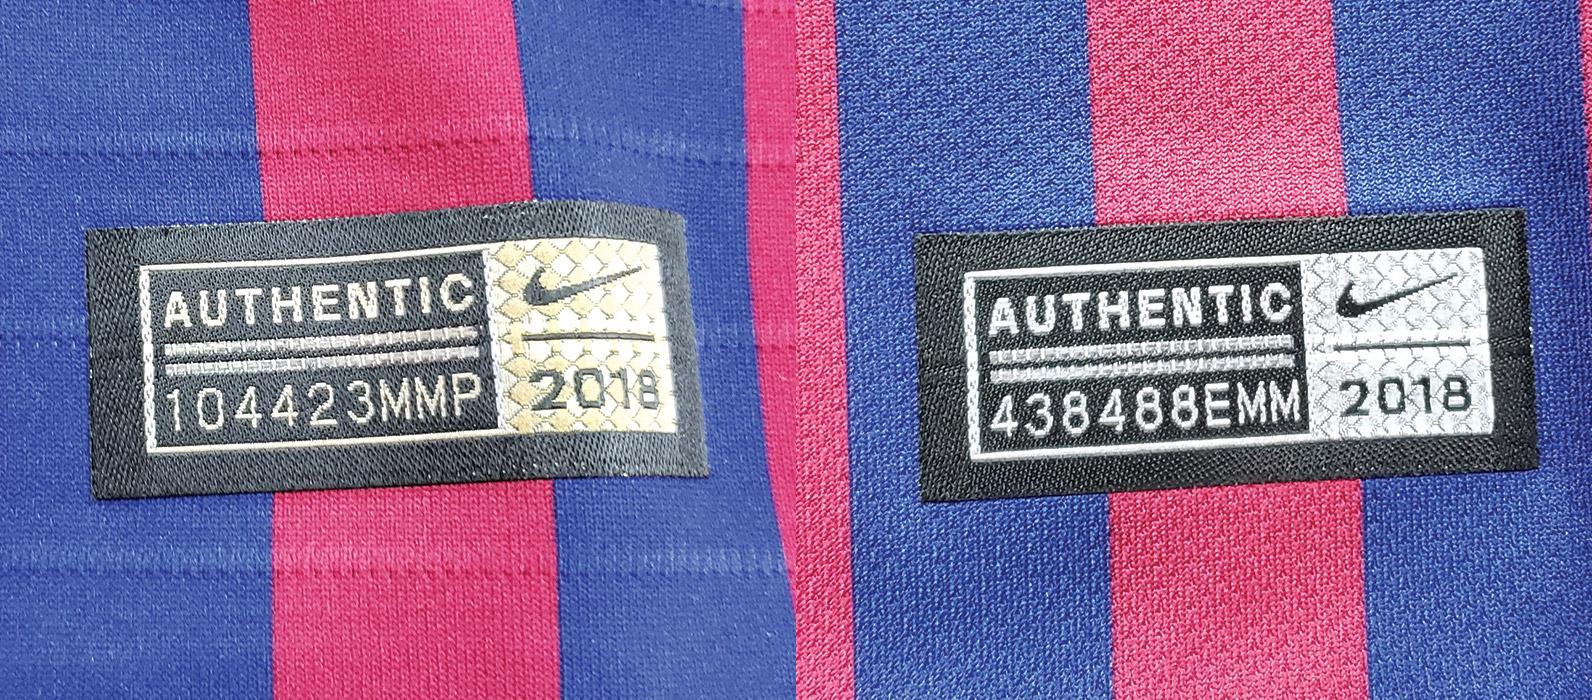 Authentic vs. Replica Soccer Jerseys - AuthenticSoccer.com